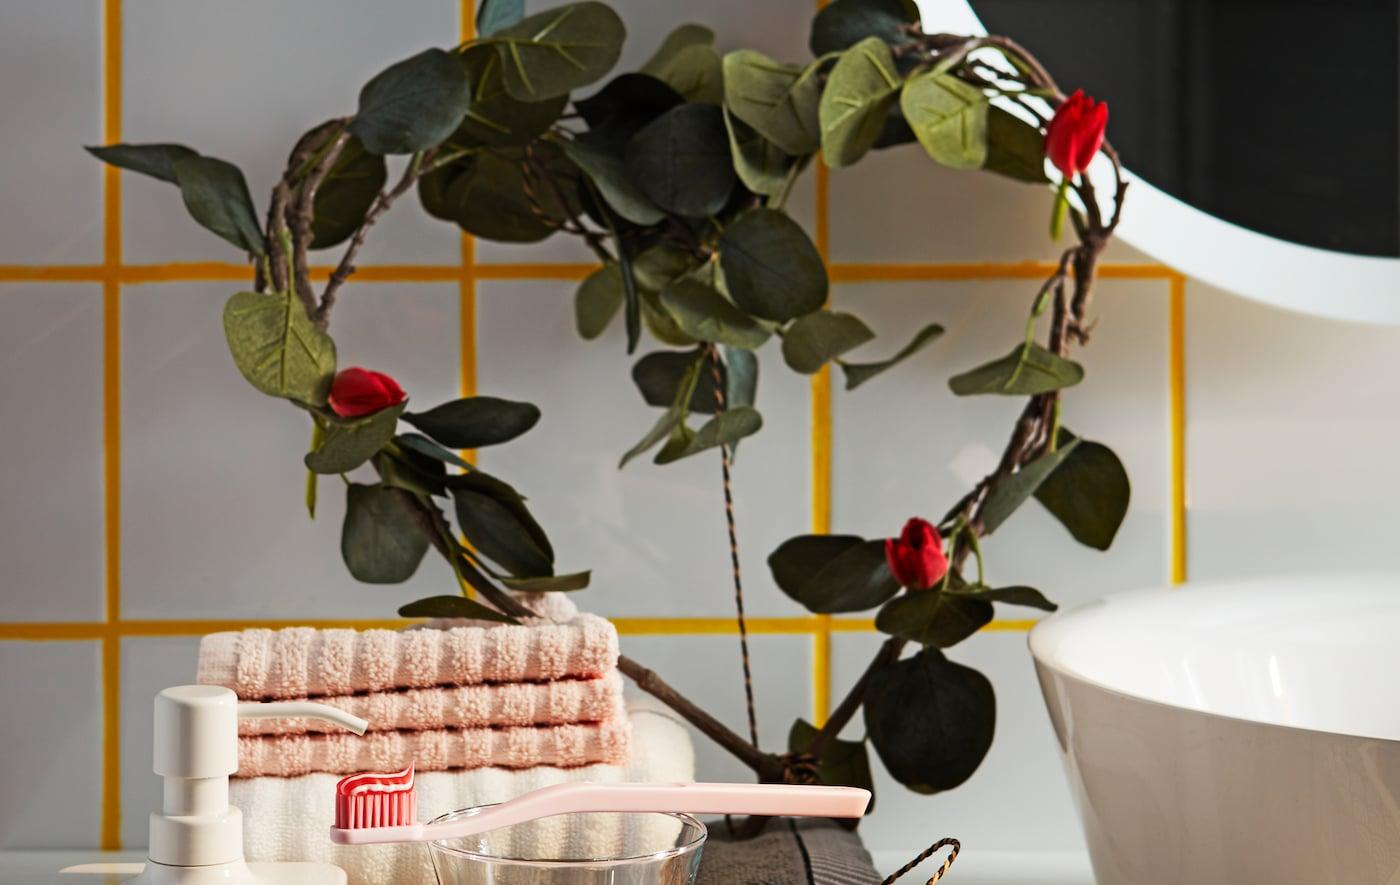 Eucalyptus green IKEA SMYCKA artificial leaf branches shaped like a heart, decorating a bathroom shelf.